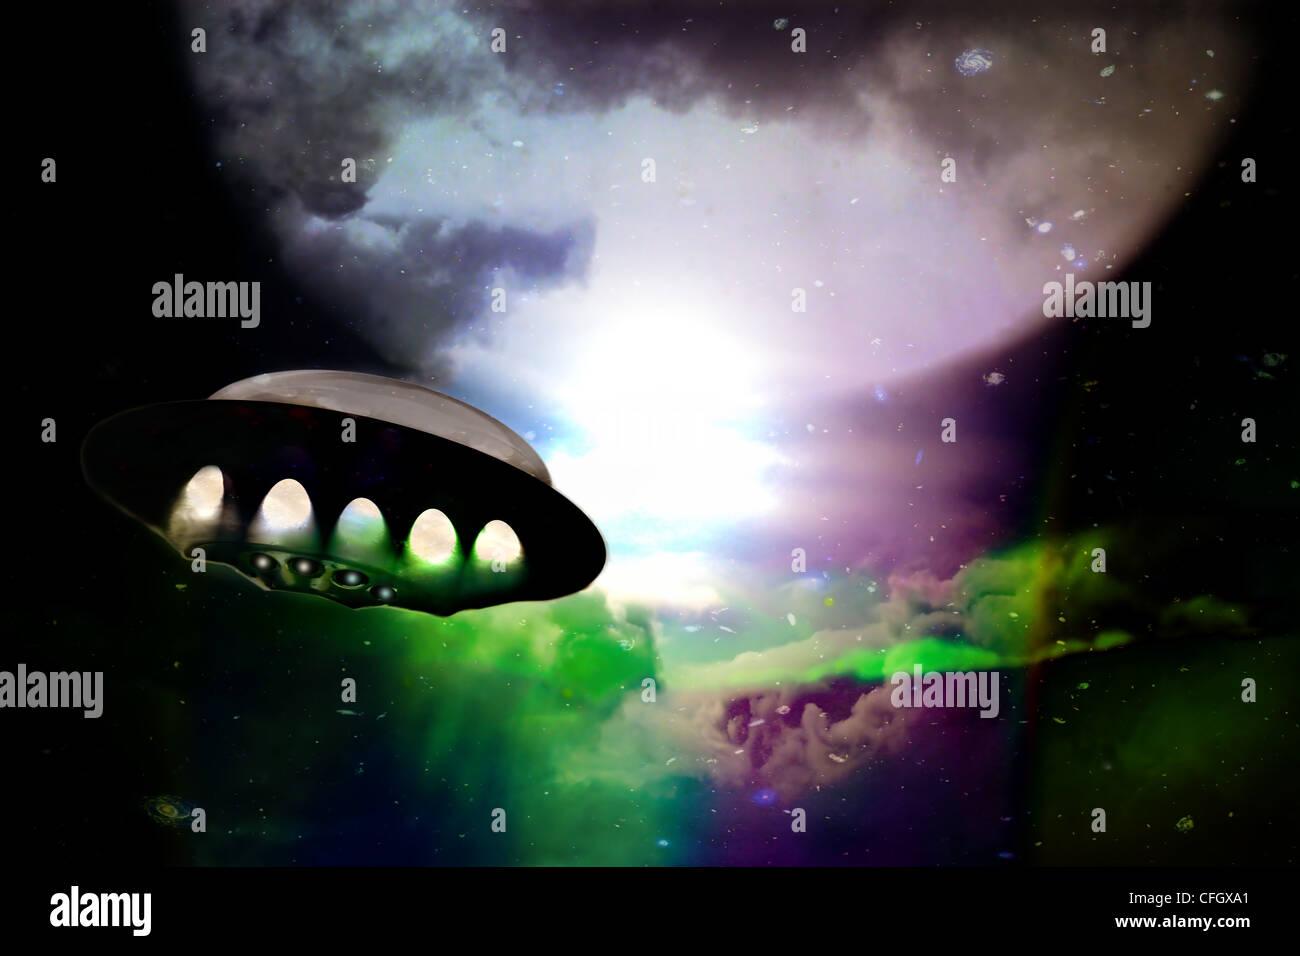 Spaceship traveling through deep space. - Stock Image